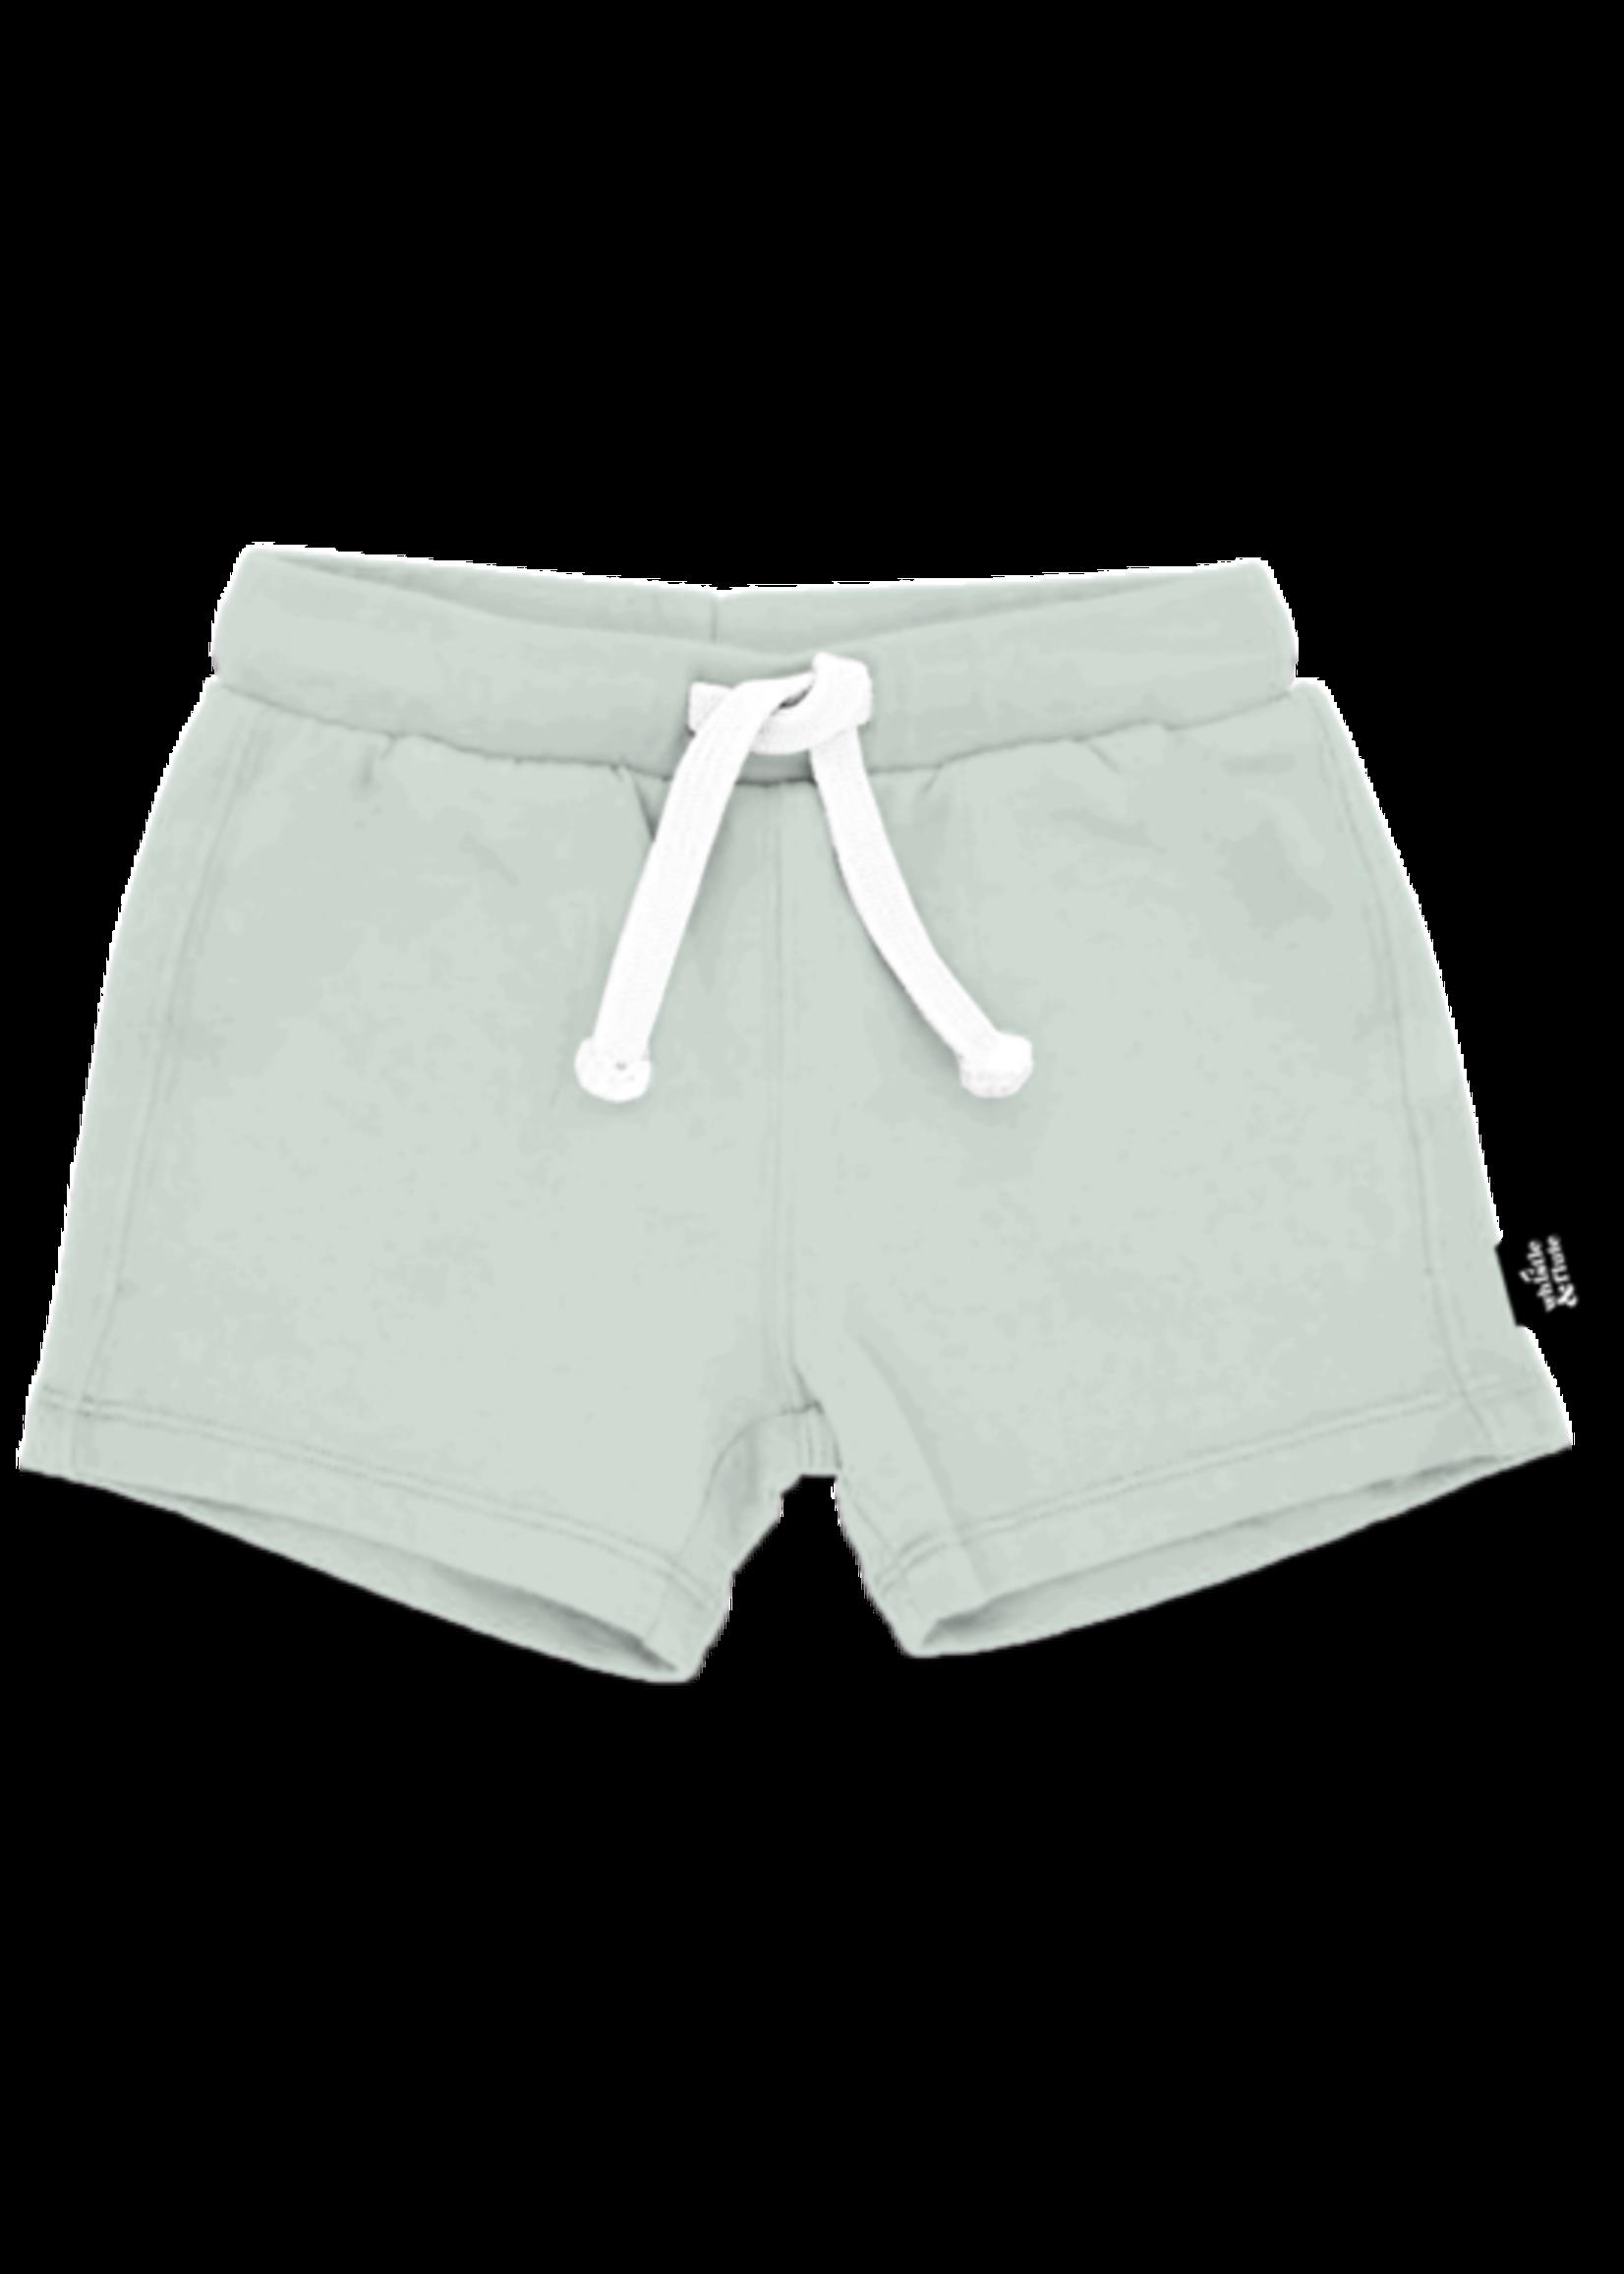 Whistle & Flute Whistle & Flute Drawstring Shorts (Mint)